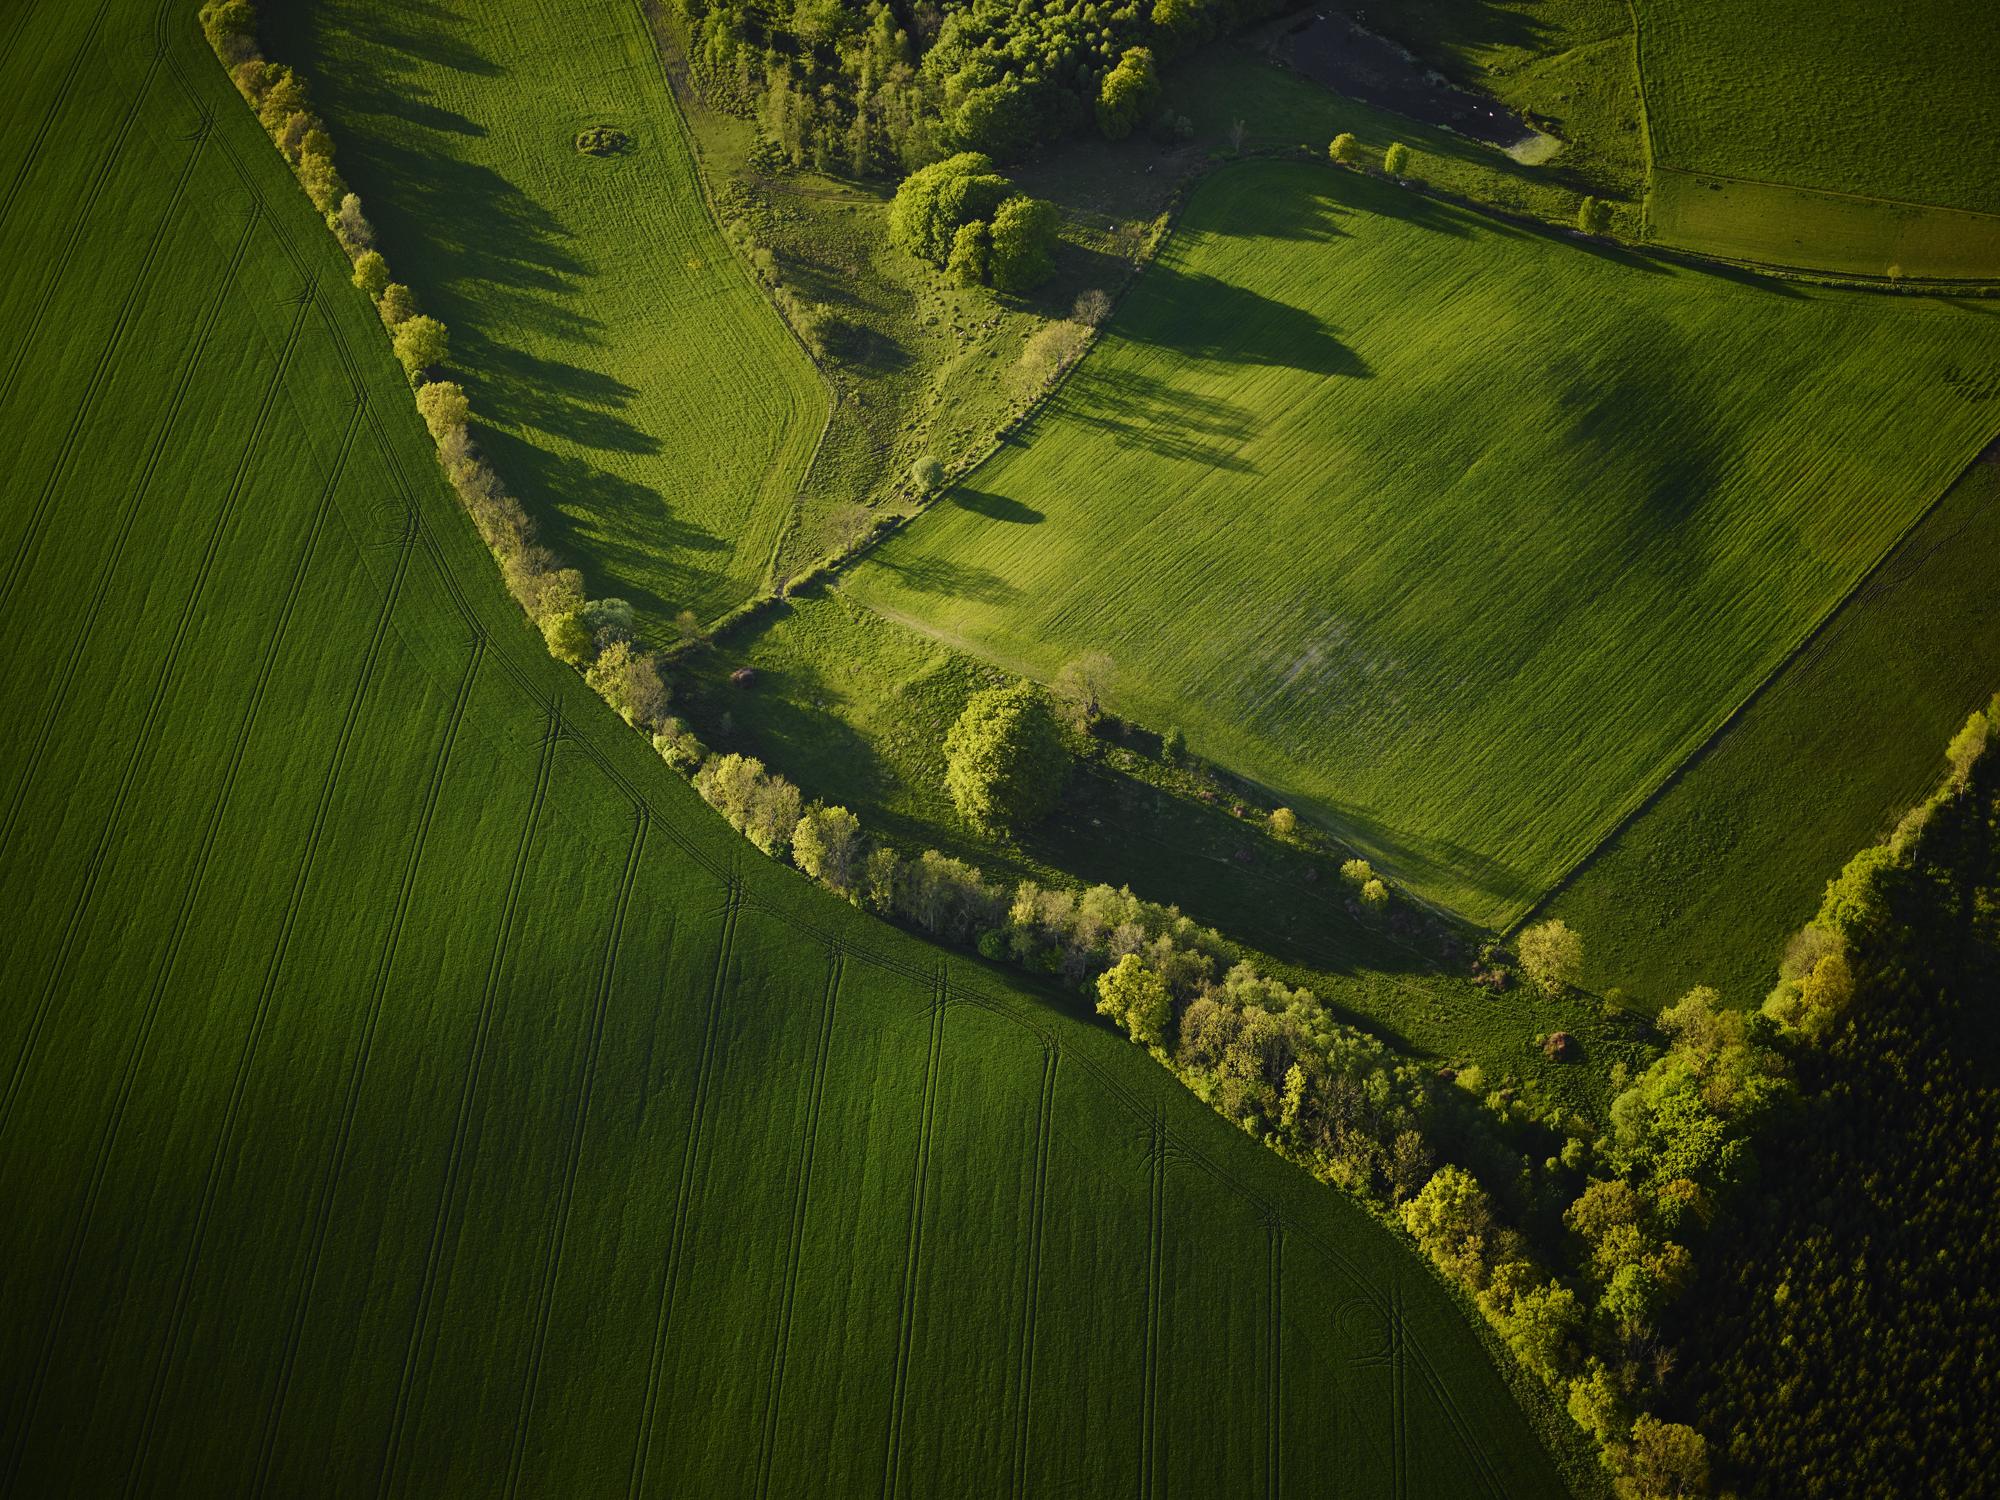 Landshypotek-Skane-1806.jpg